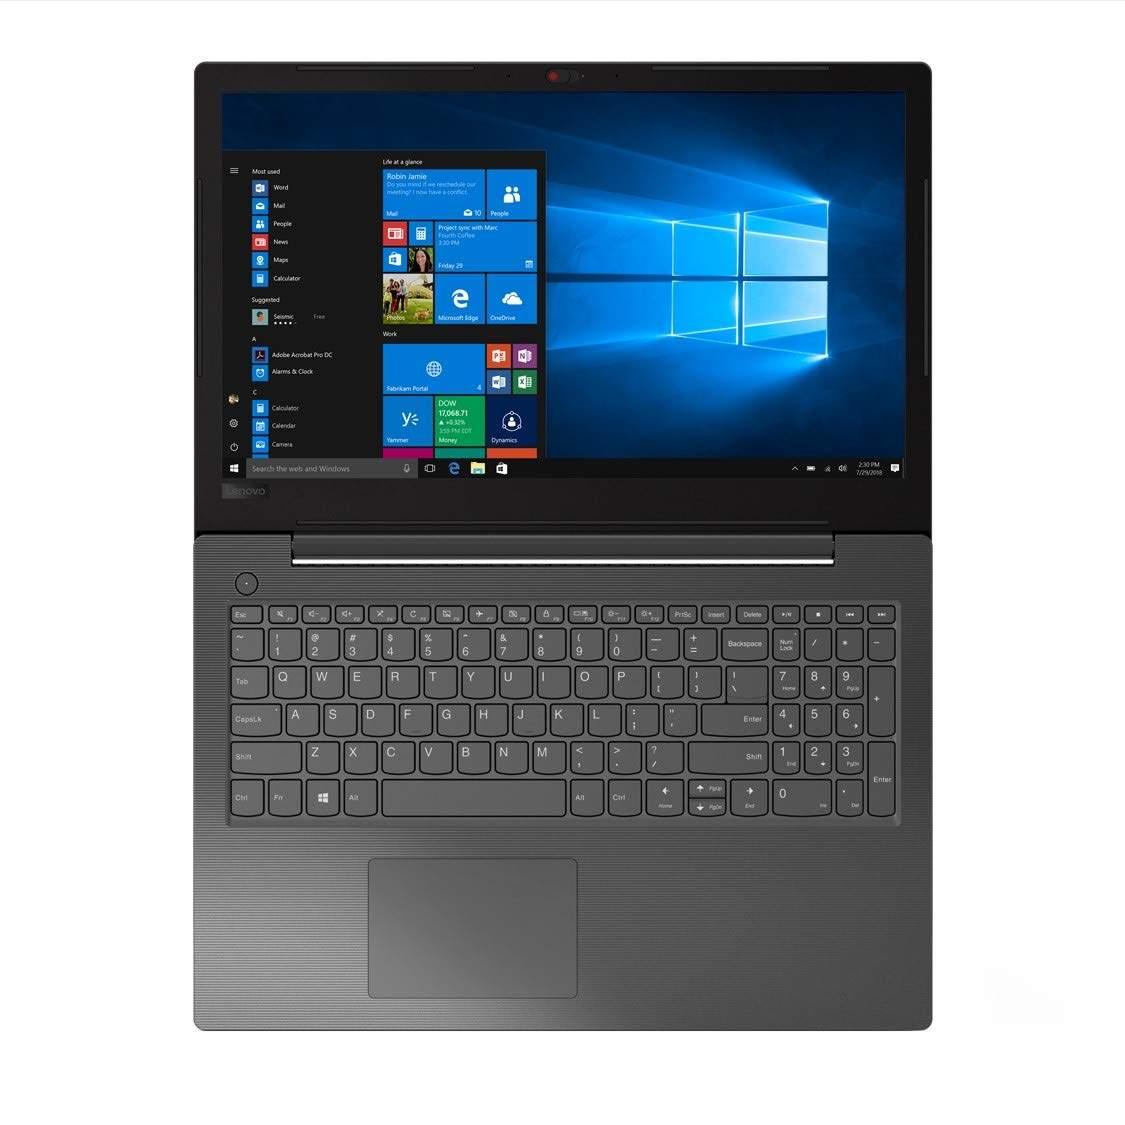 Lenovo V130 Intel Core I3 7Th Gen 15.6-Inch Hd Thin And Light Laptop (4Gb Ram, 1Tb Hdd, Windows 10 Home, 2Gb Amd Radeon 530 Graphics, With Dvd Drive, Grey, 1.80 Kg), 81Hna00Tih